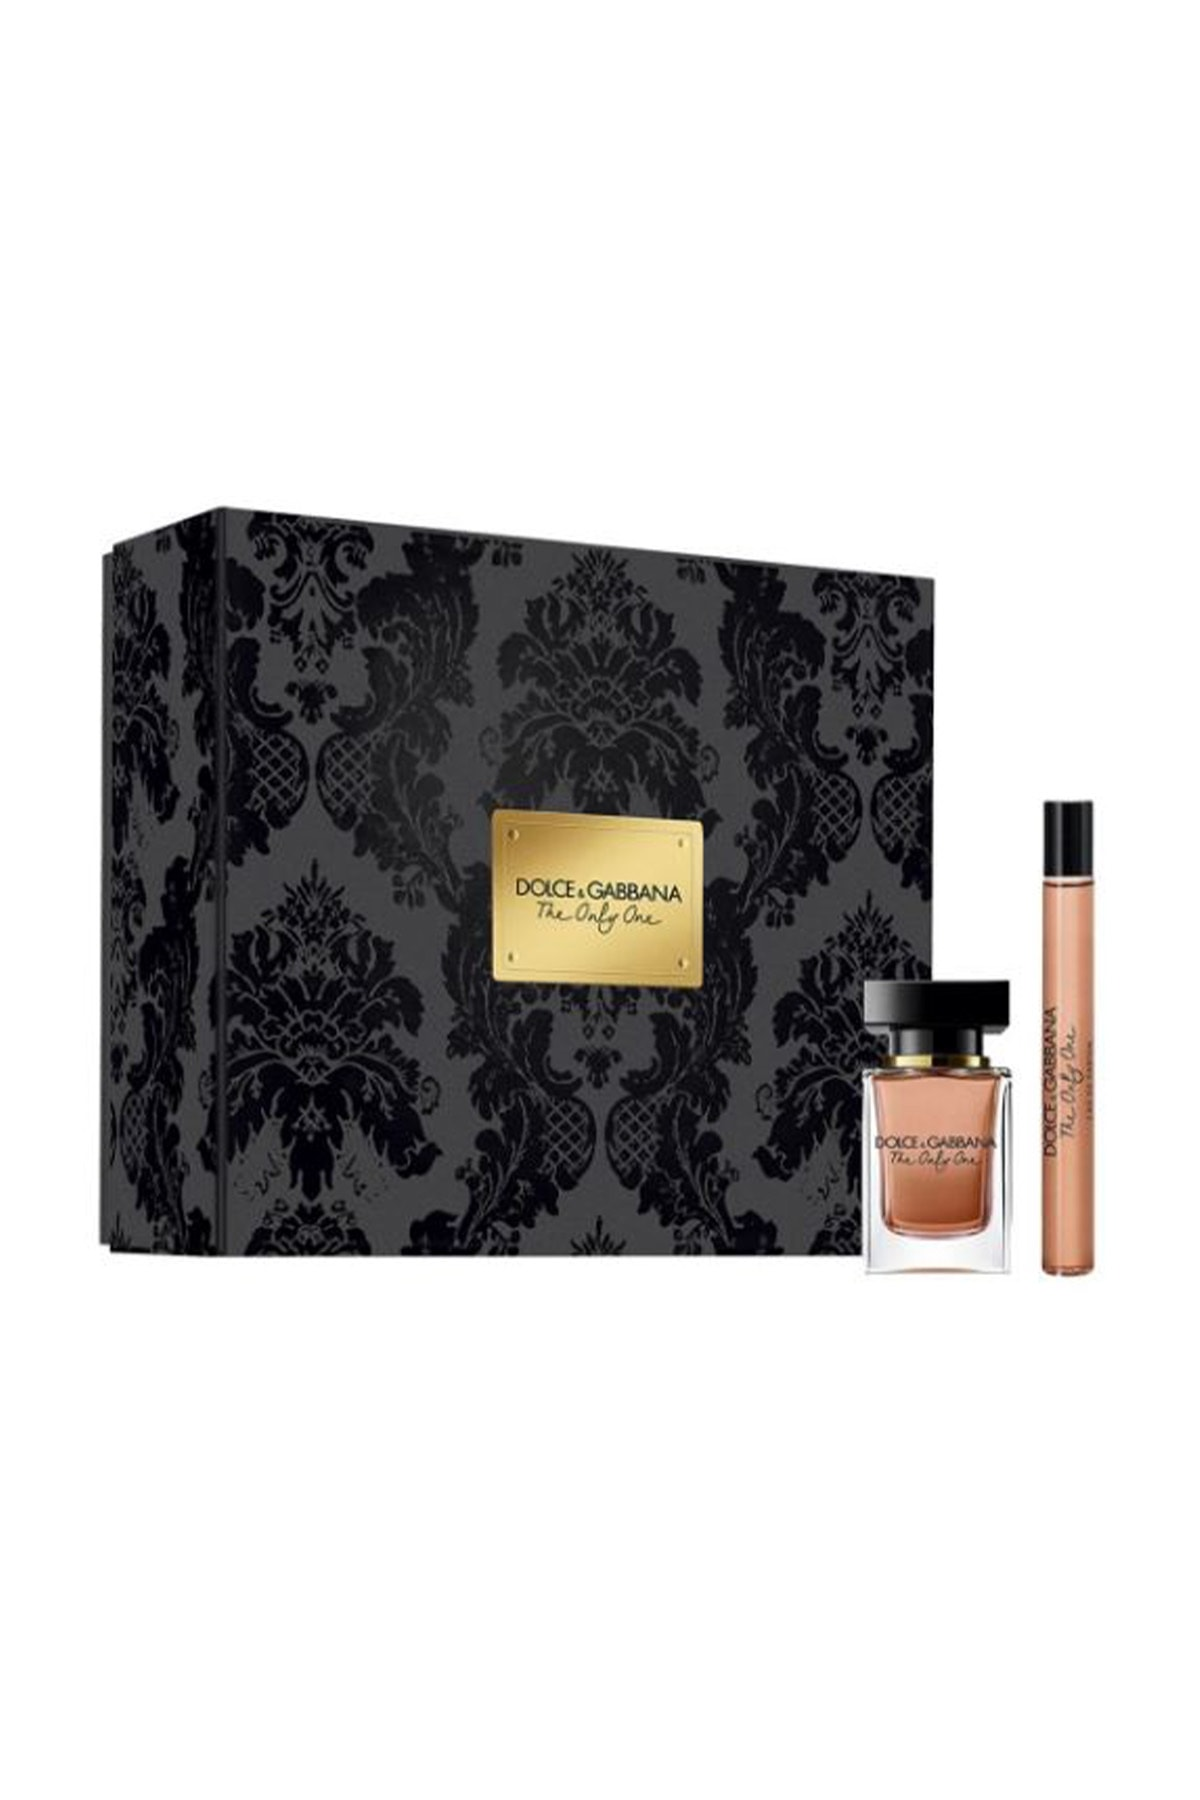 Dolce Gabbana The Only One Edp 30 ml + Edp 10 ml 3423220000792 0